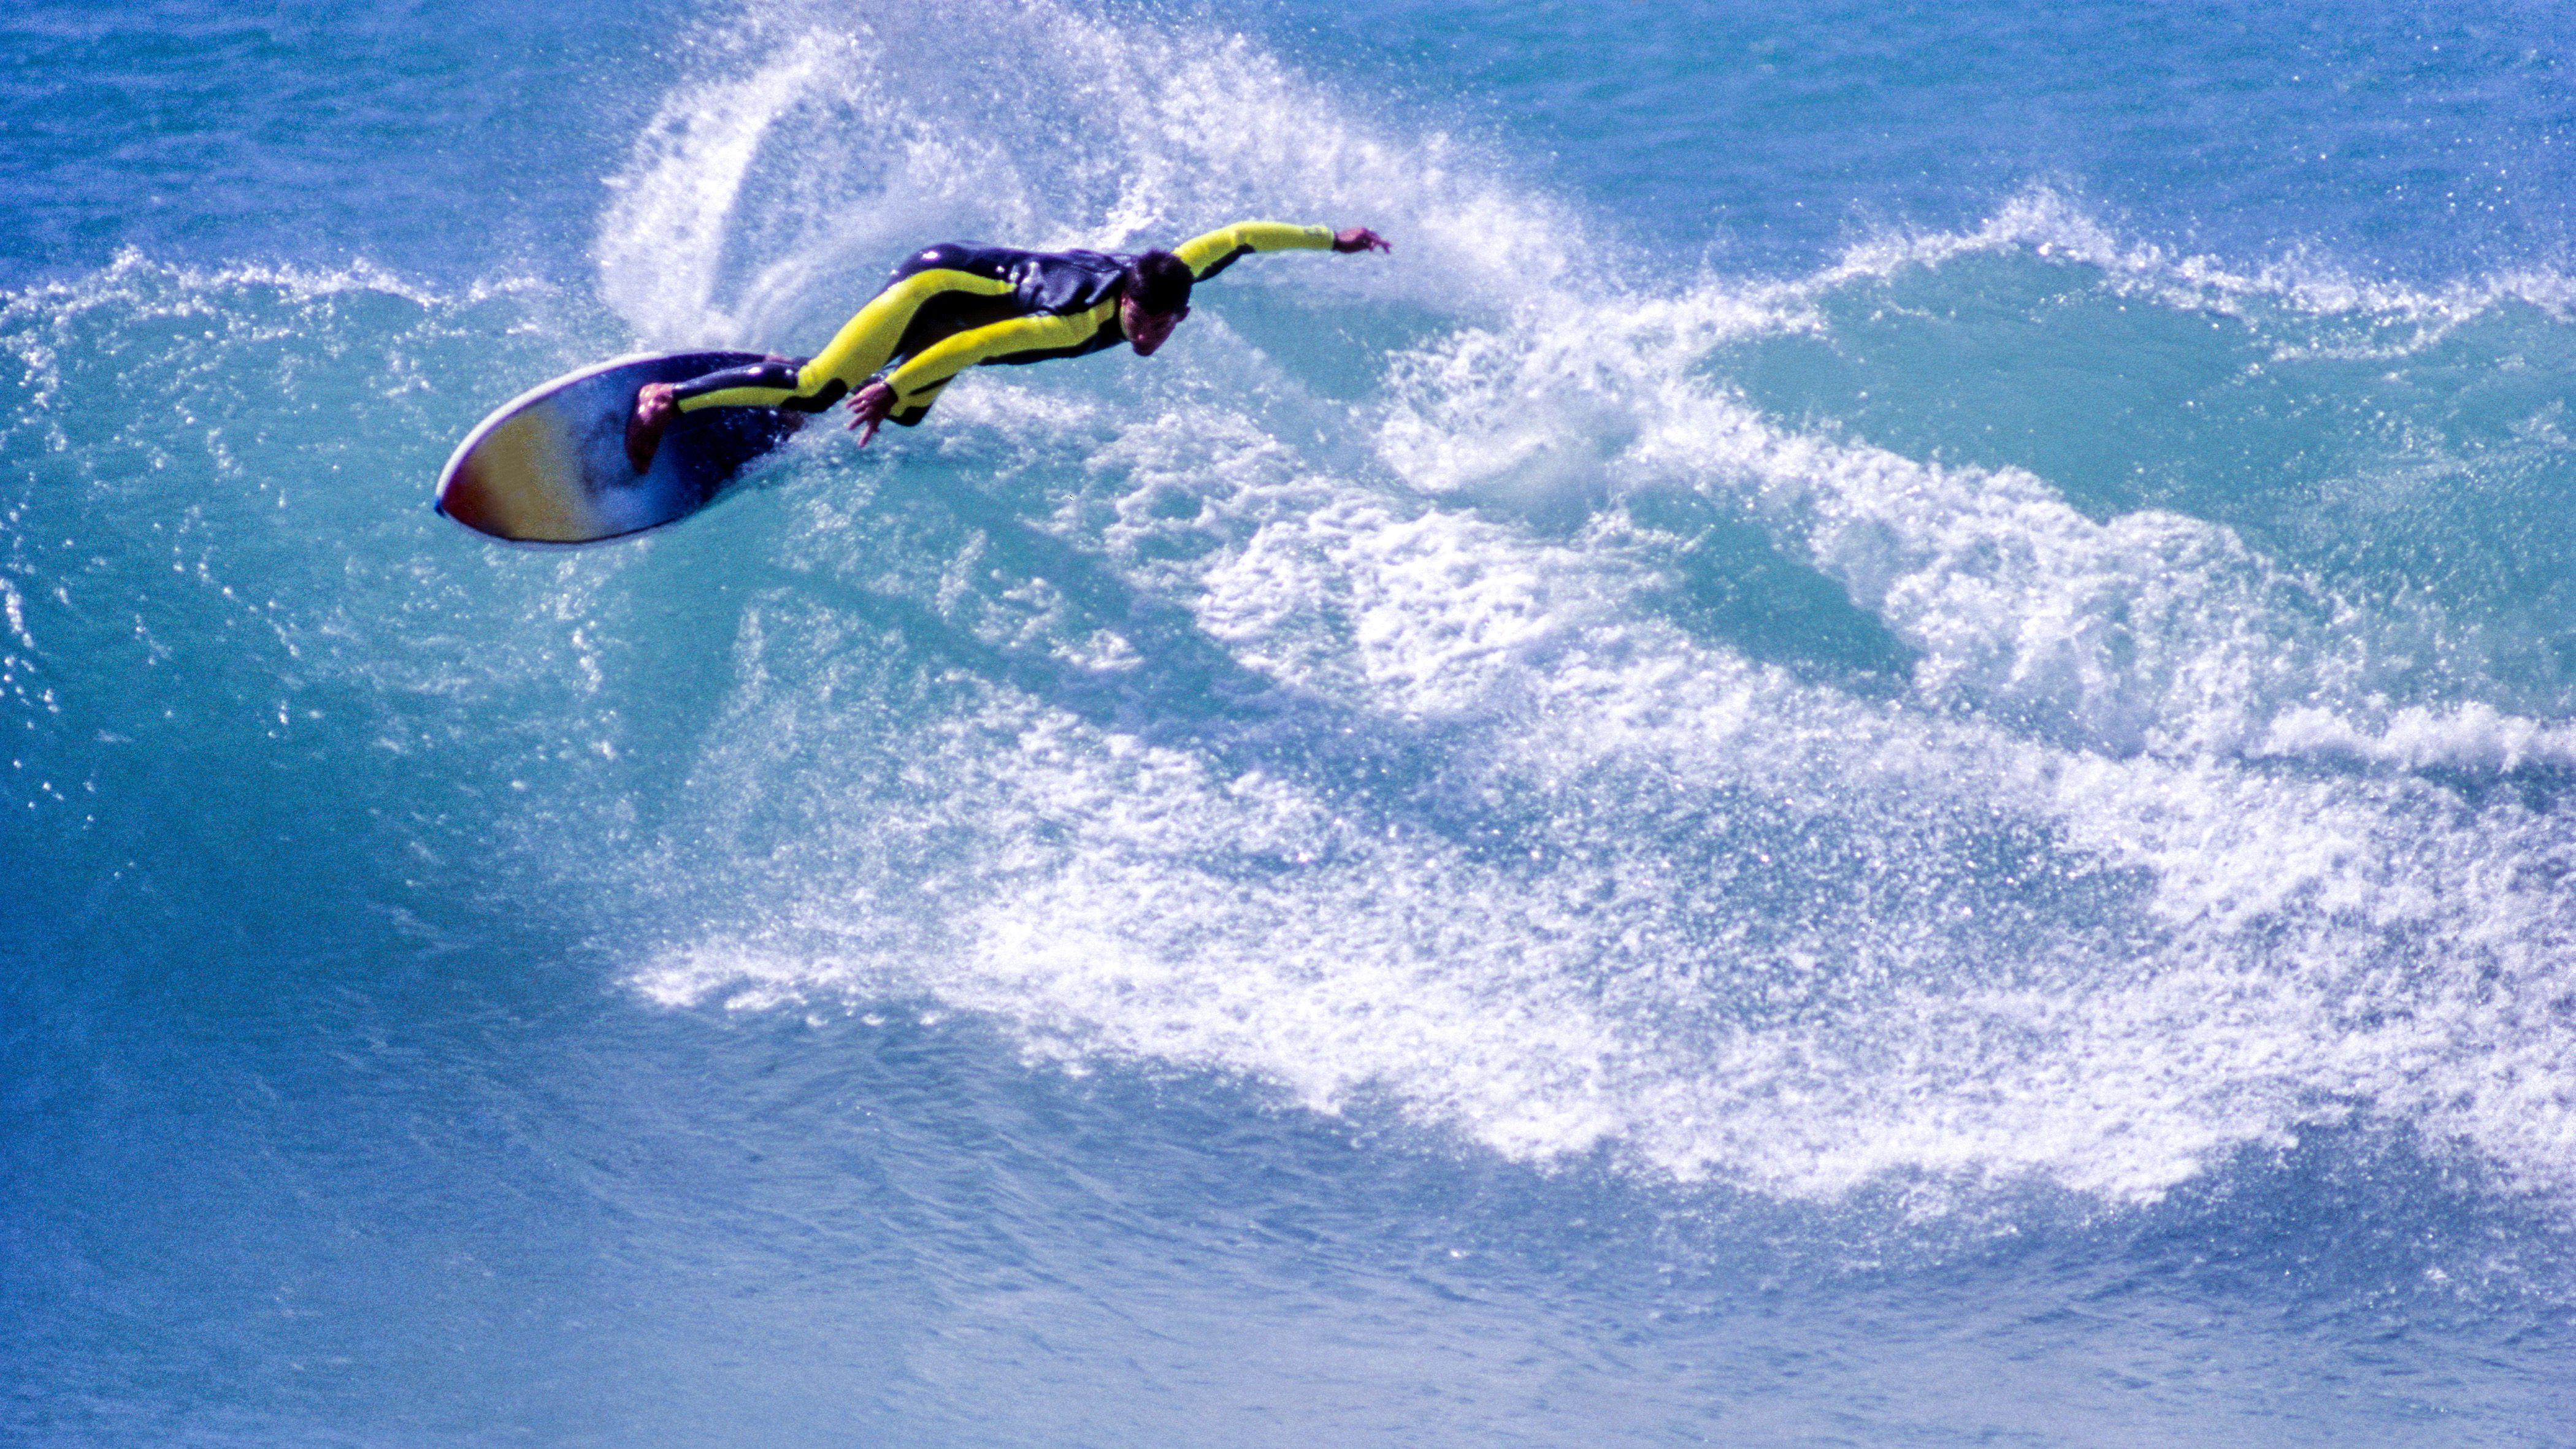 Morocco, Agadir, Tagazhout, surfing in the north Atlantic Ocean